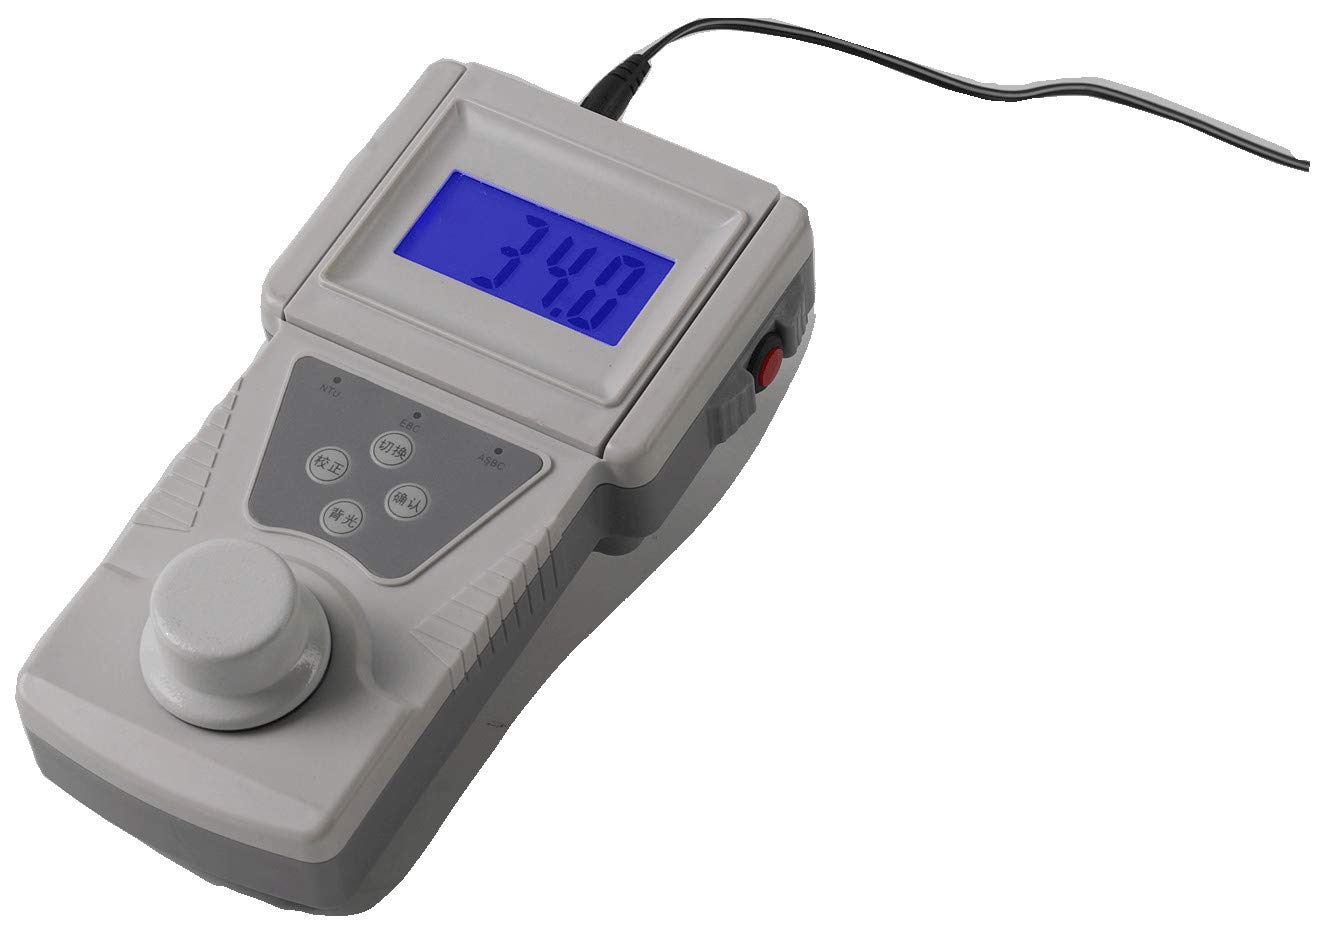 CGOLDENWALL Digital Portable Turbidity Meter Portable Turbidimeter Liquid Handheld Turbidity Tester (0-400NTU, 400-1000NTU/0.1) by CGOLDENWALL